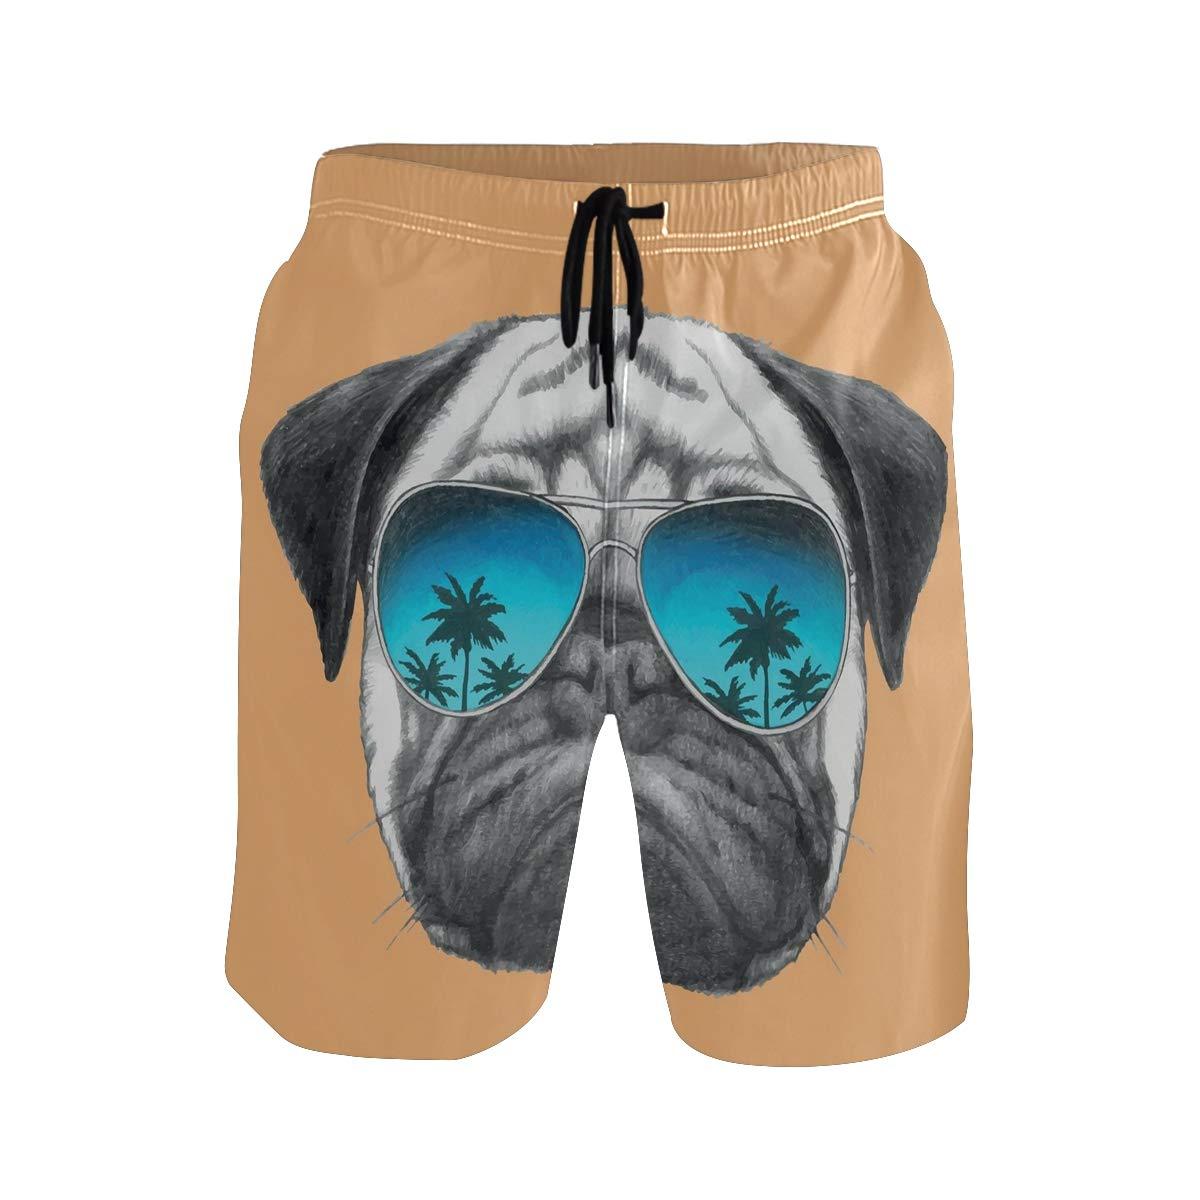 COVASA Mens Summer ShortsDog with Reflecting Aviators Palm Trees Tropical Envi